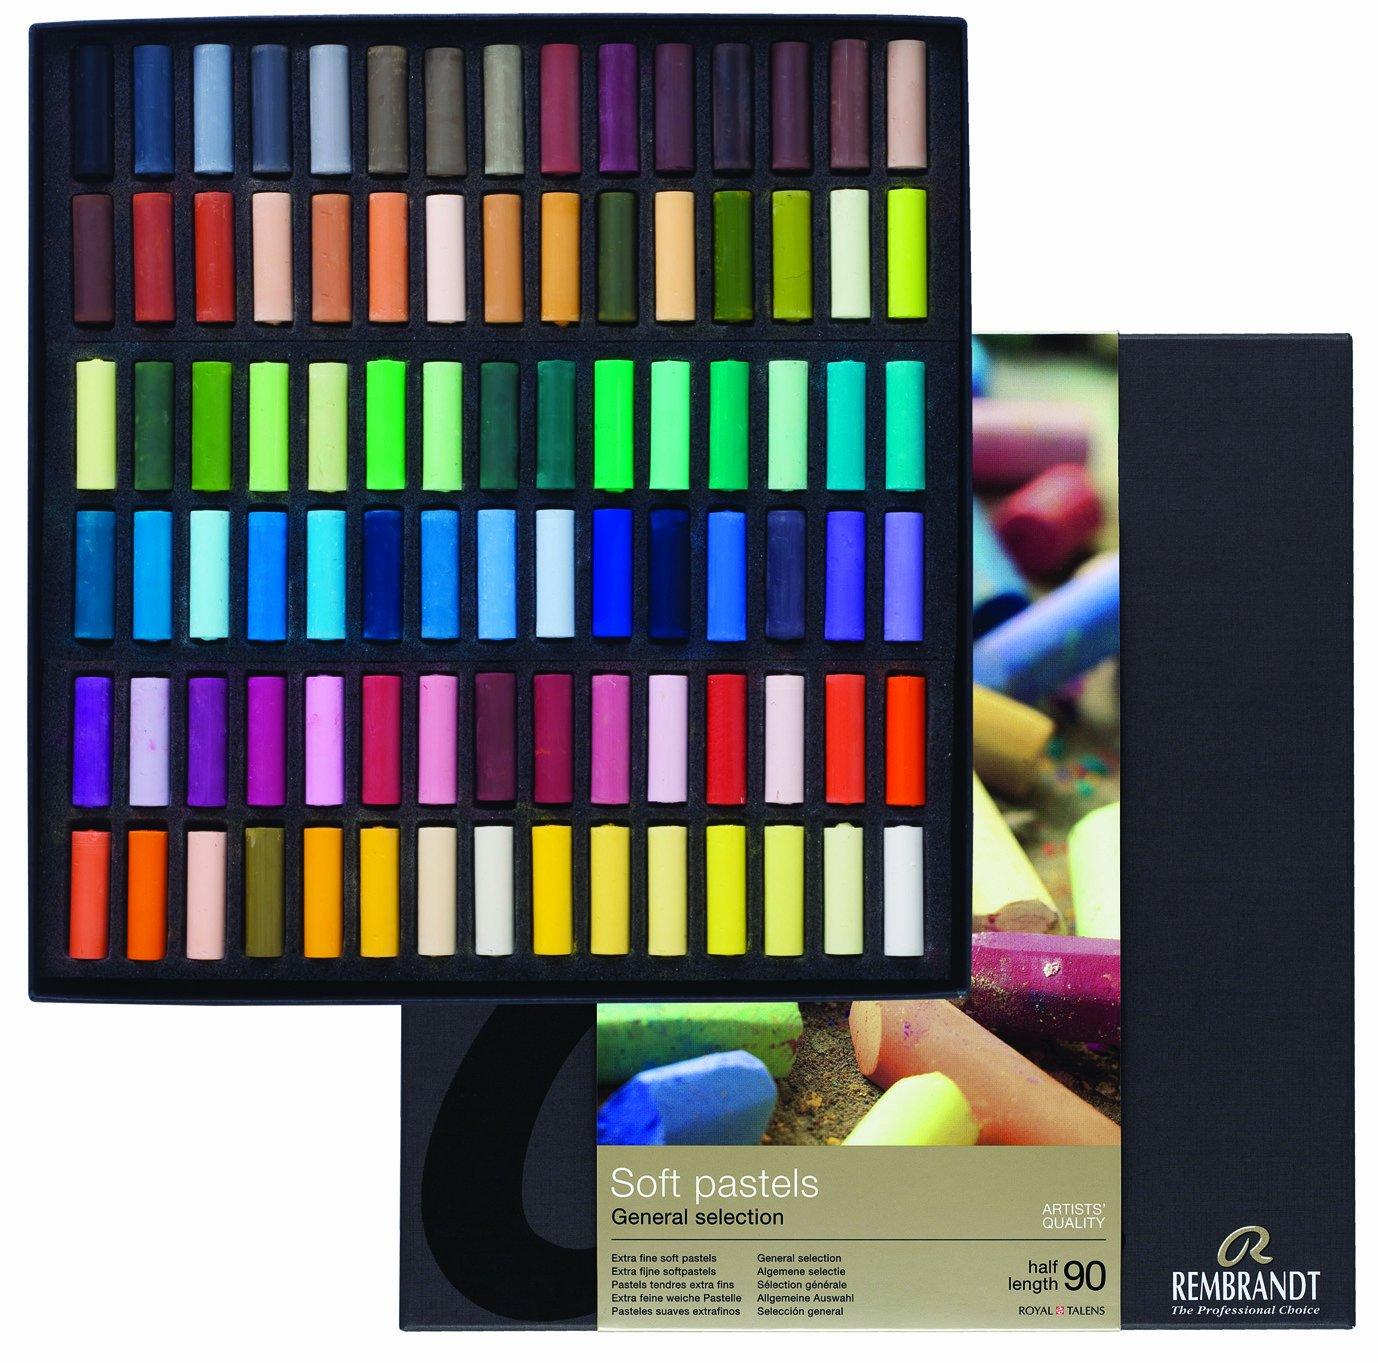 Sconosciuto Rembrandt Soft Pastels 90Half Stick General Set Canson Inc. 100515685